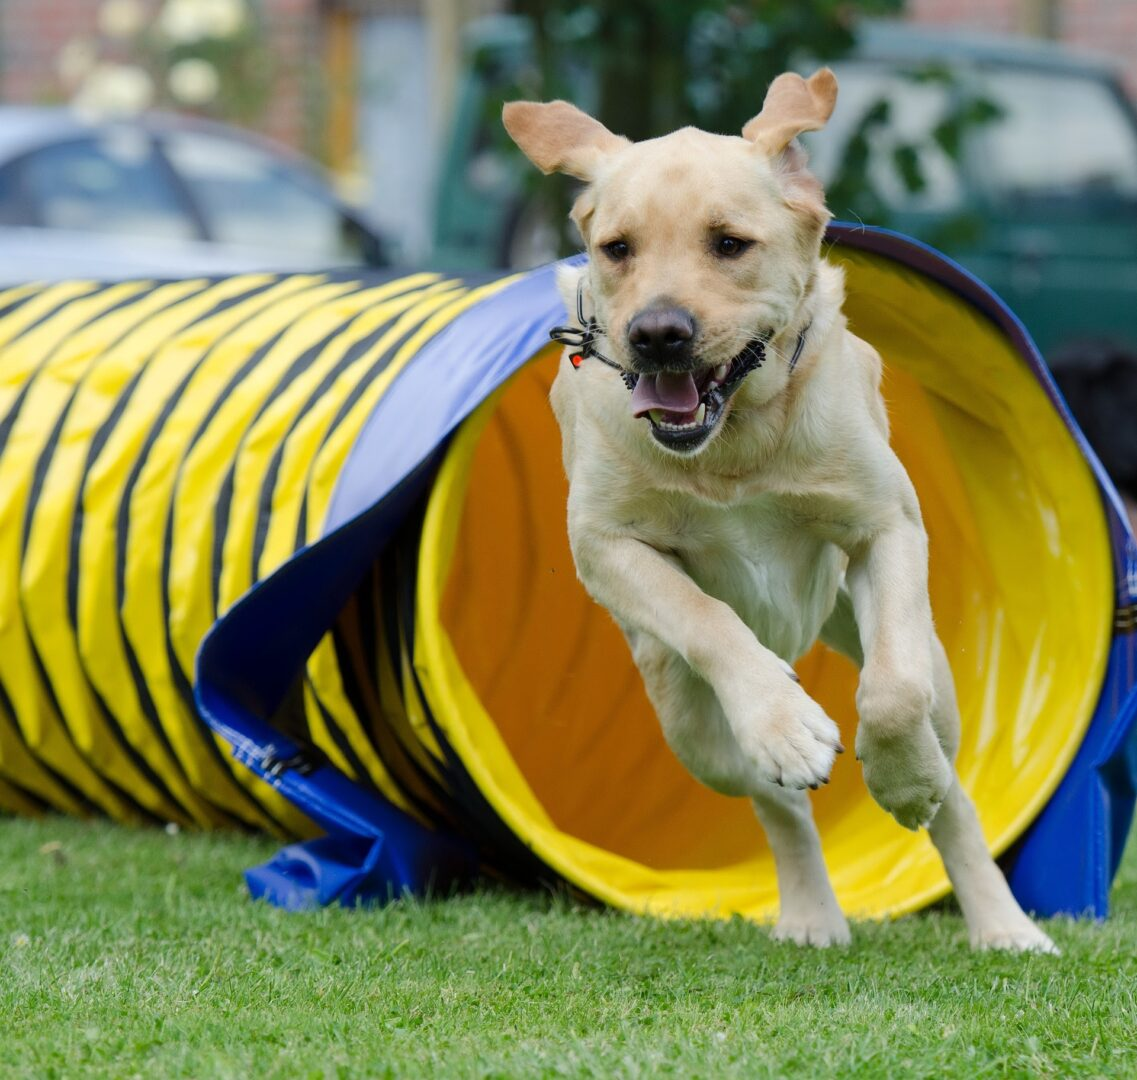 Dog running through agility course